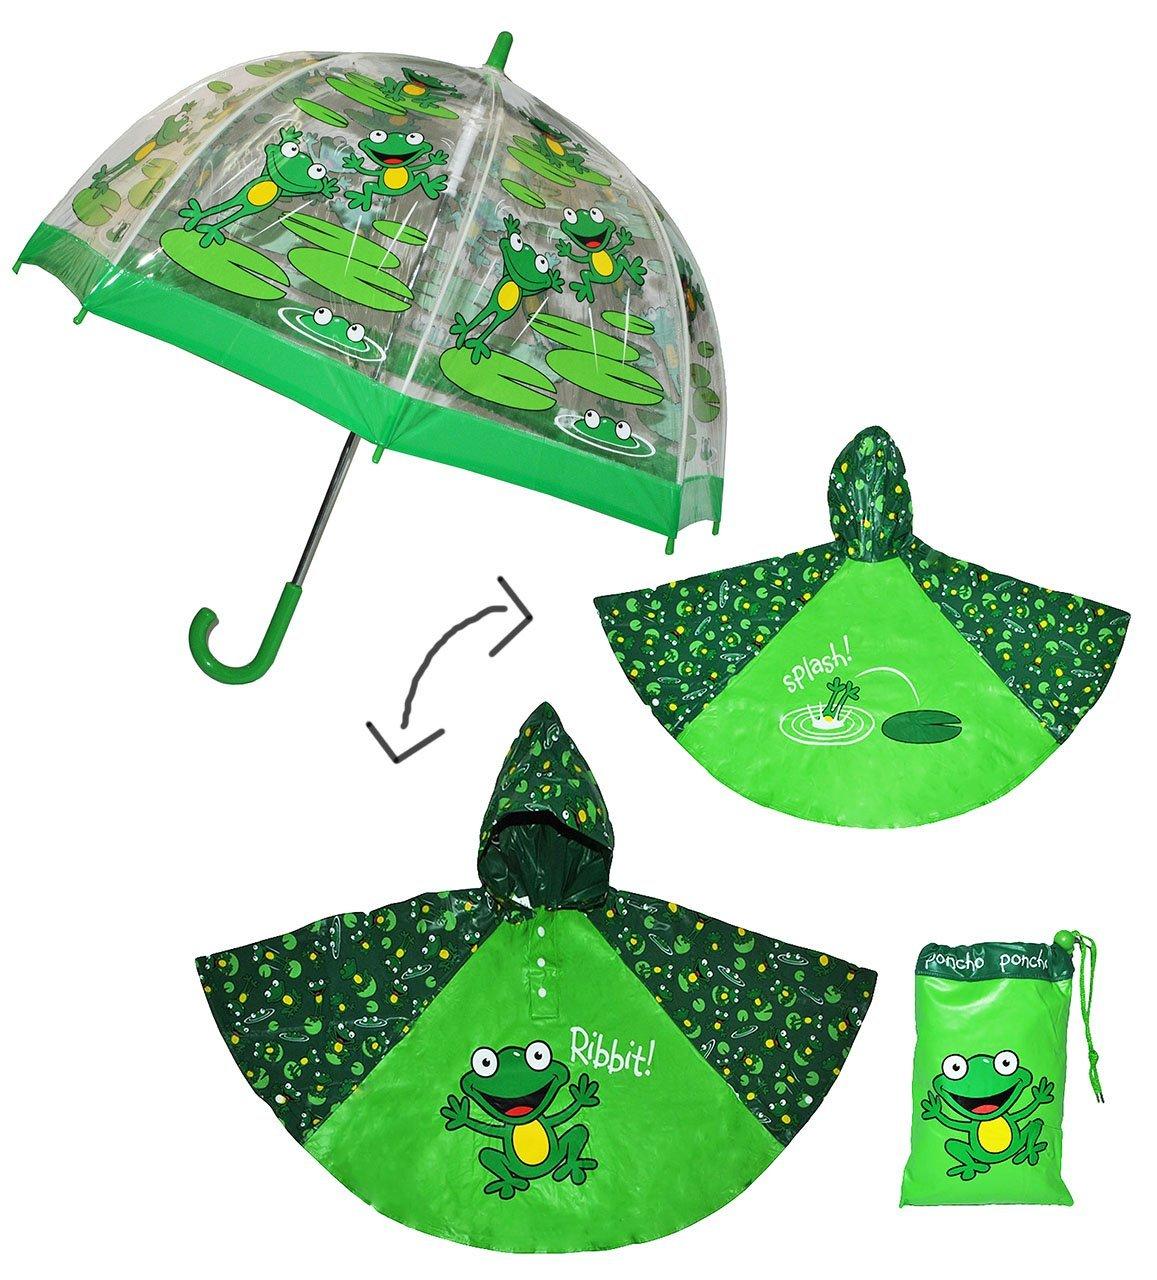 Unbekannt 3 TLG. Set: Regenschirm + Regenponcho / Regencape - Frosch - incl. Namen - Gr. 104 - 128 / 3 bis 6 Jahre - Kinderschirm transparent - Kinder Stockschirm Regen.. Kinder-land